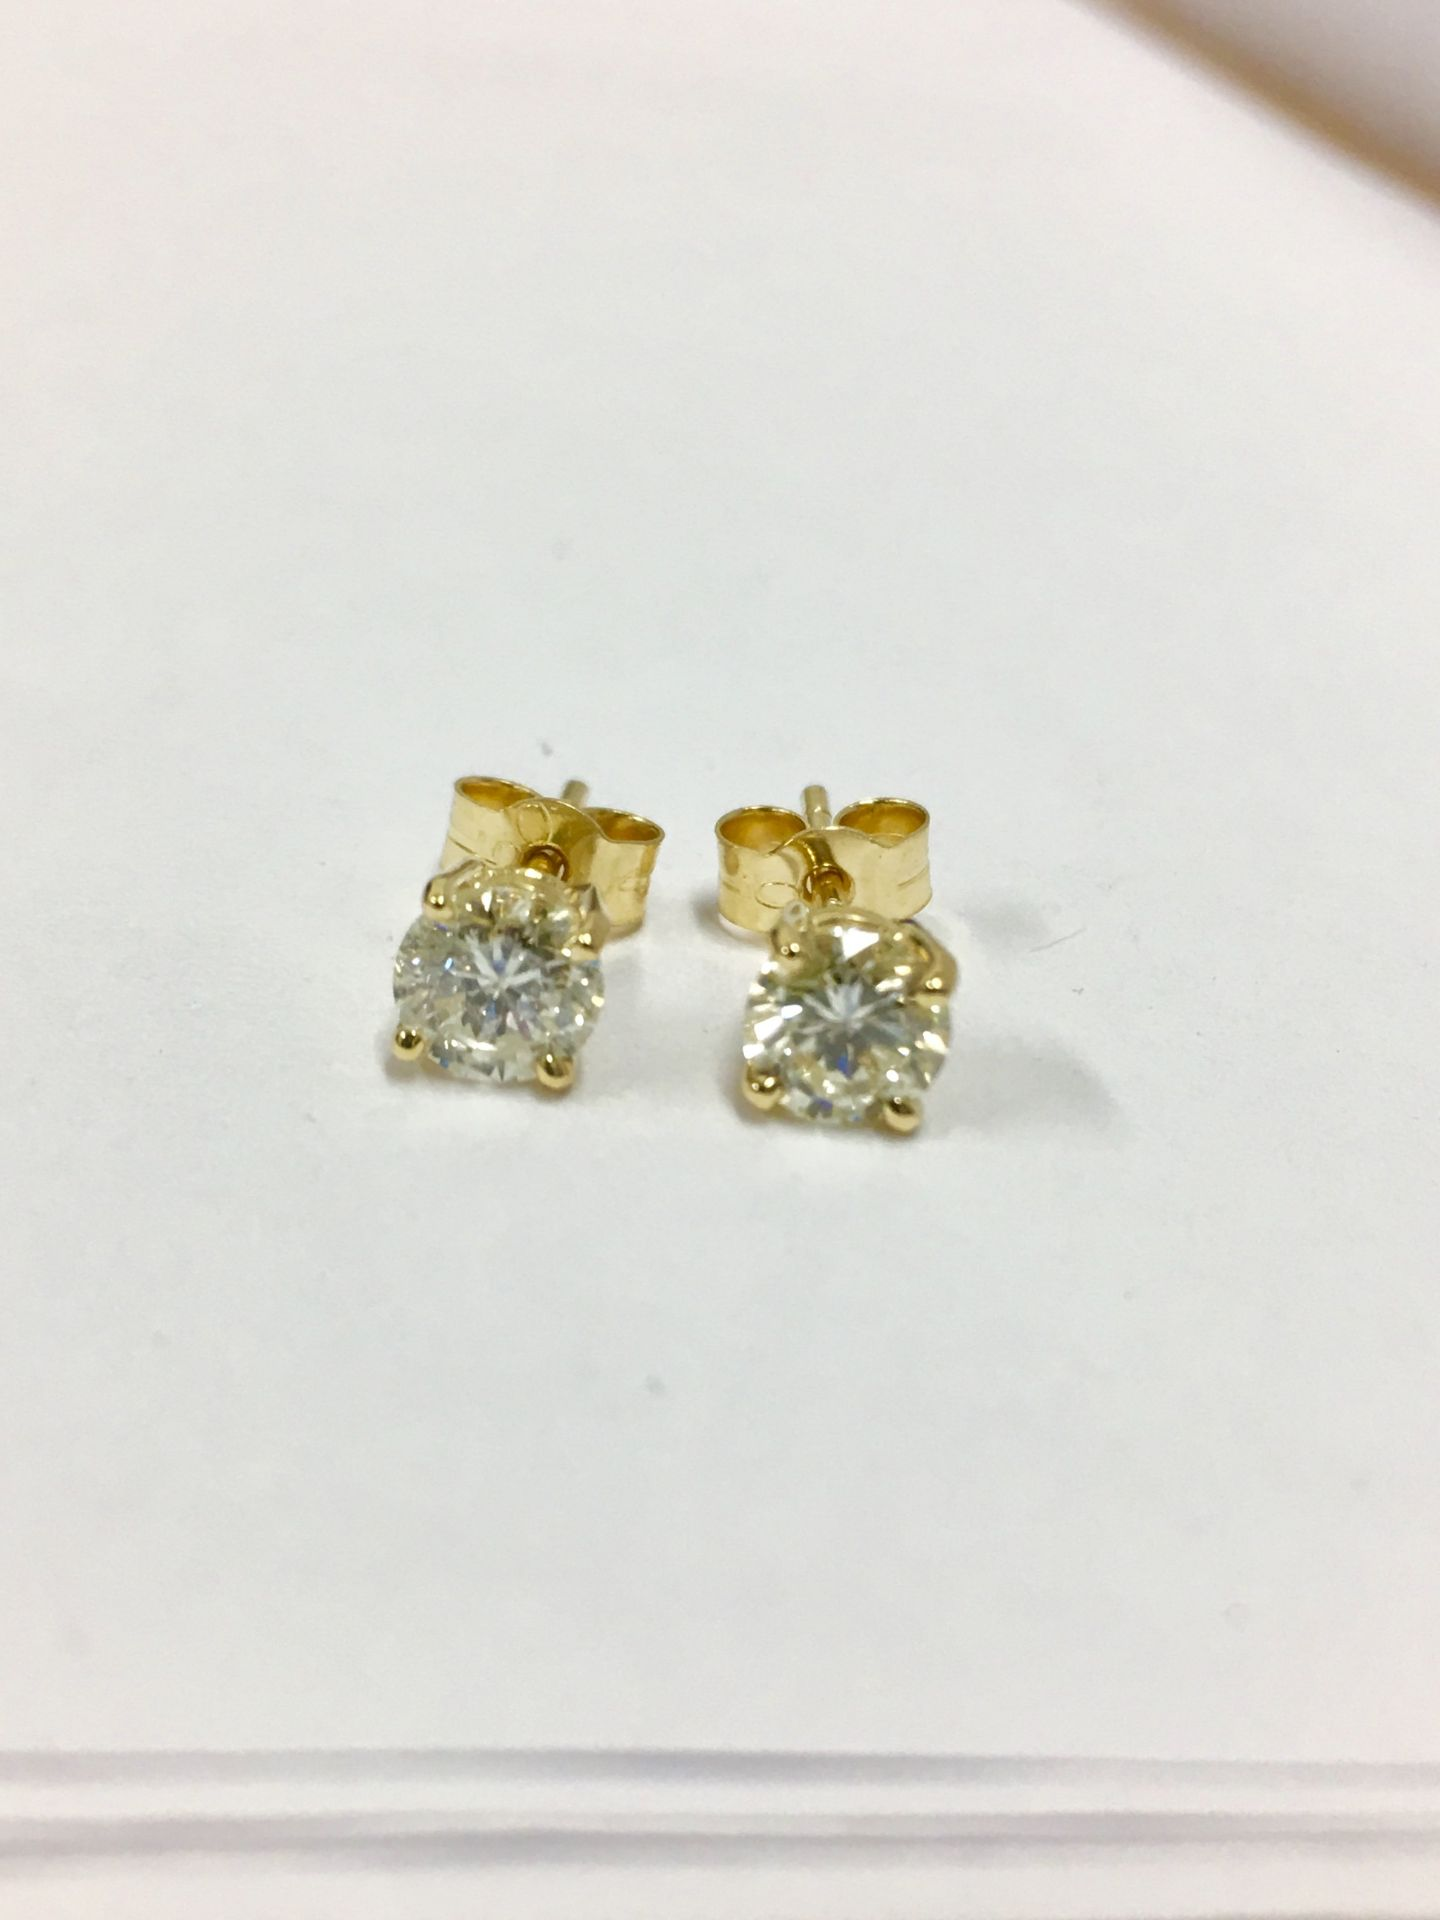 Lot 51 - 1.40Ct Diamond Solitaire Earrings Set With Brilliant Cut Diamonds,